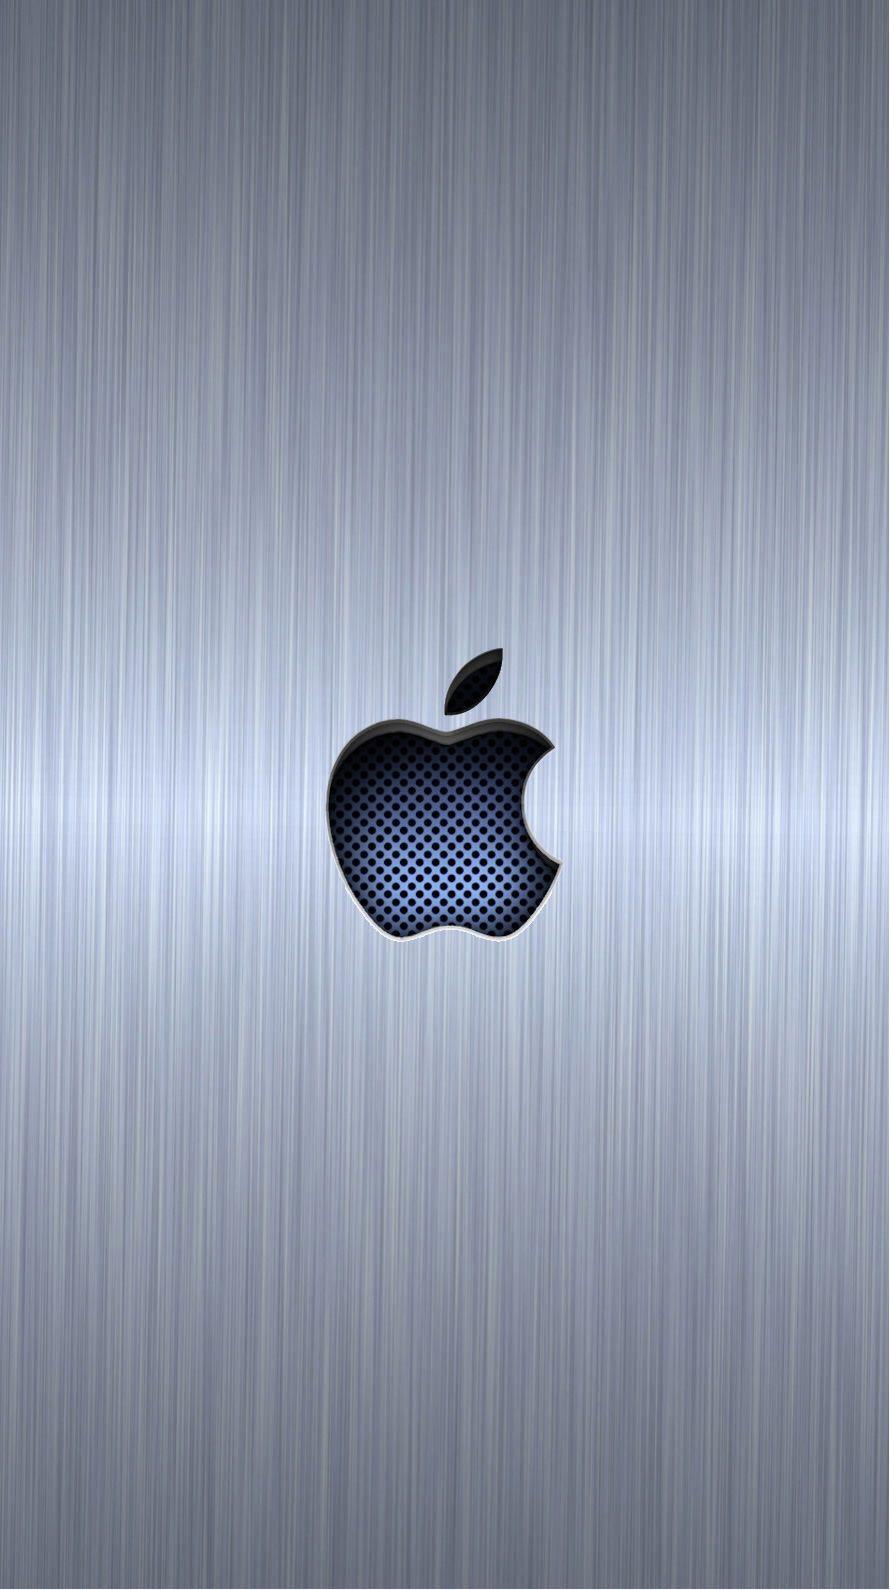 Iphone 6 Parallax Wallpaper Apple